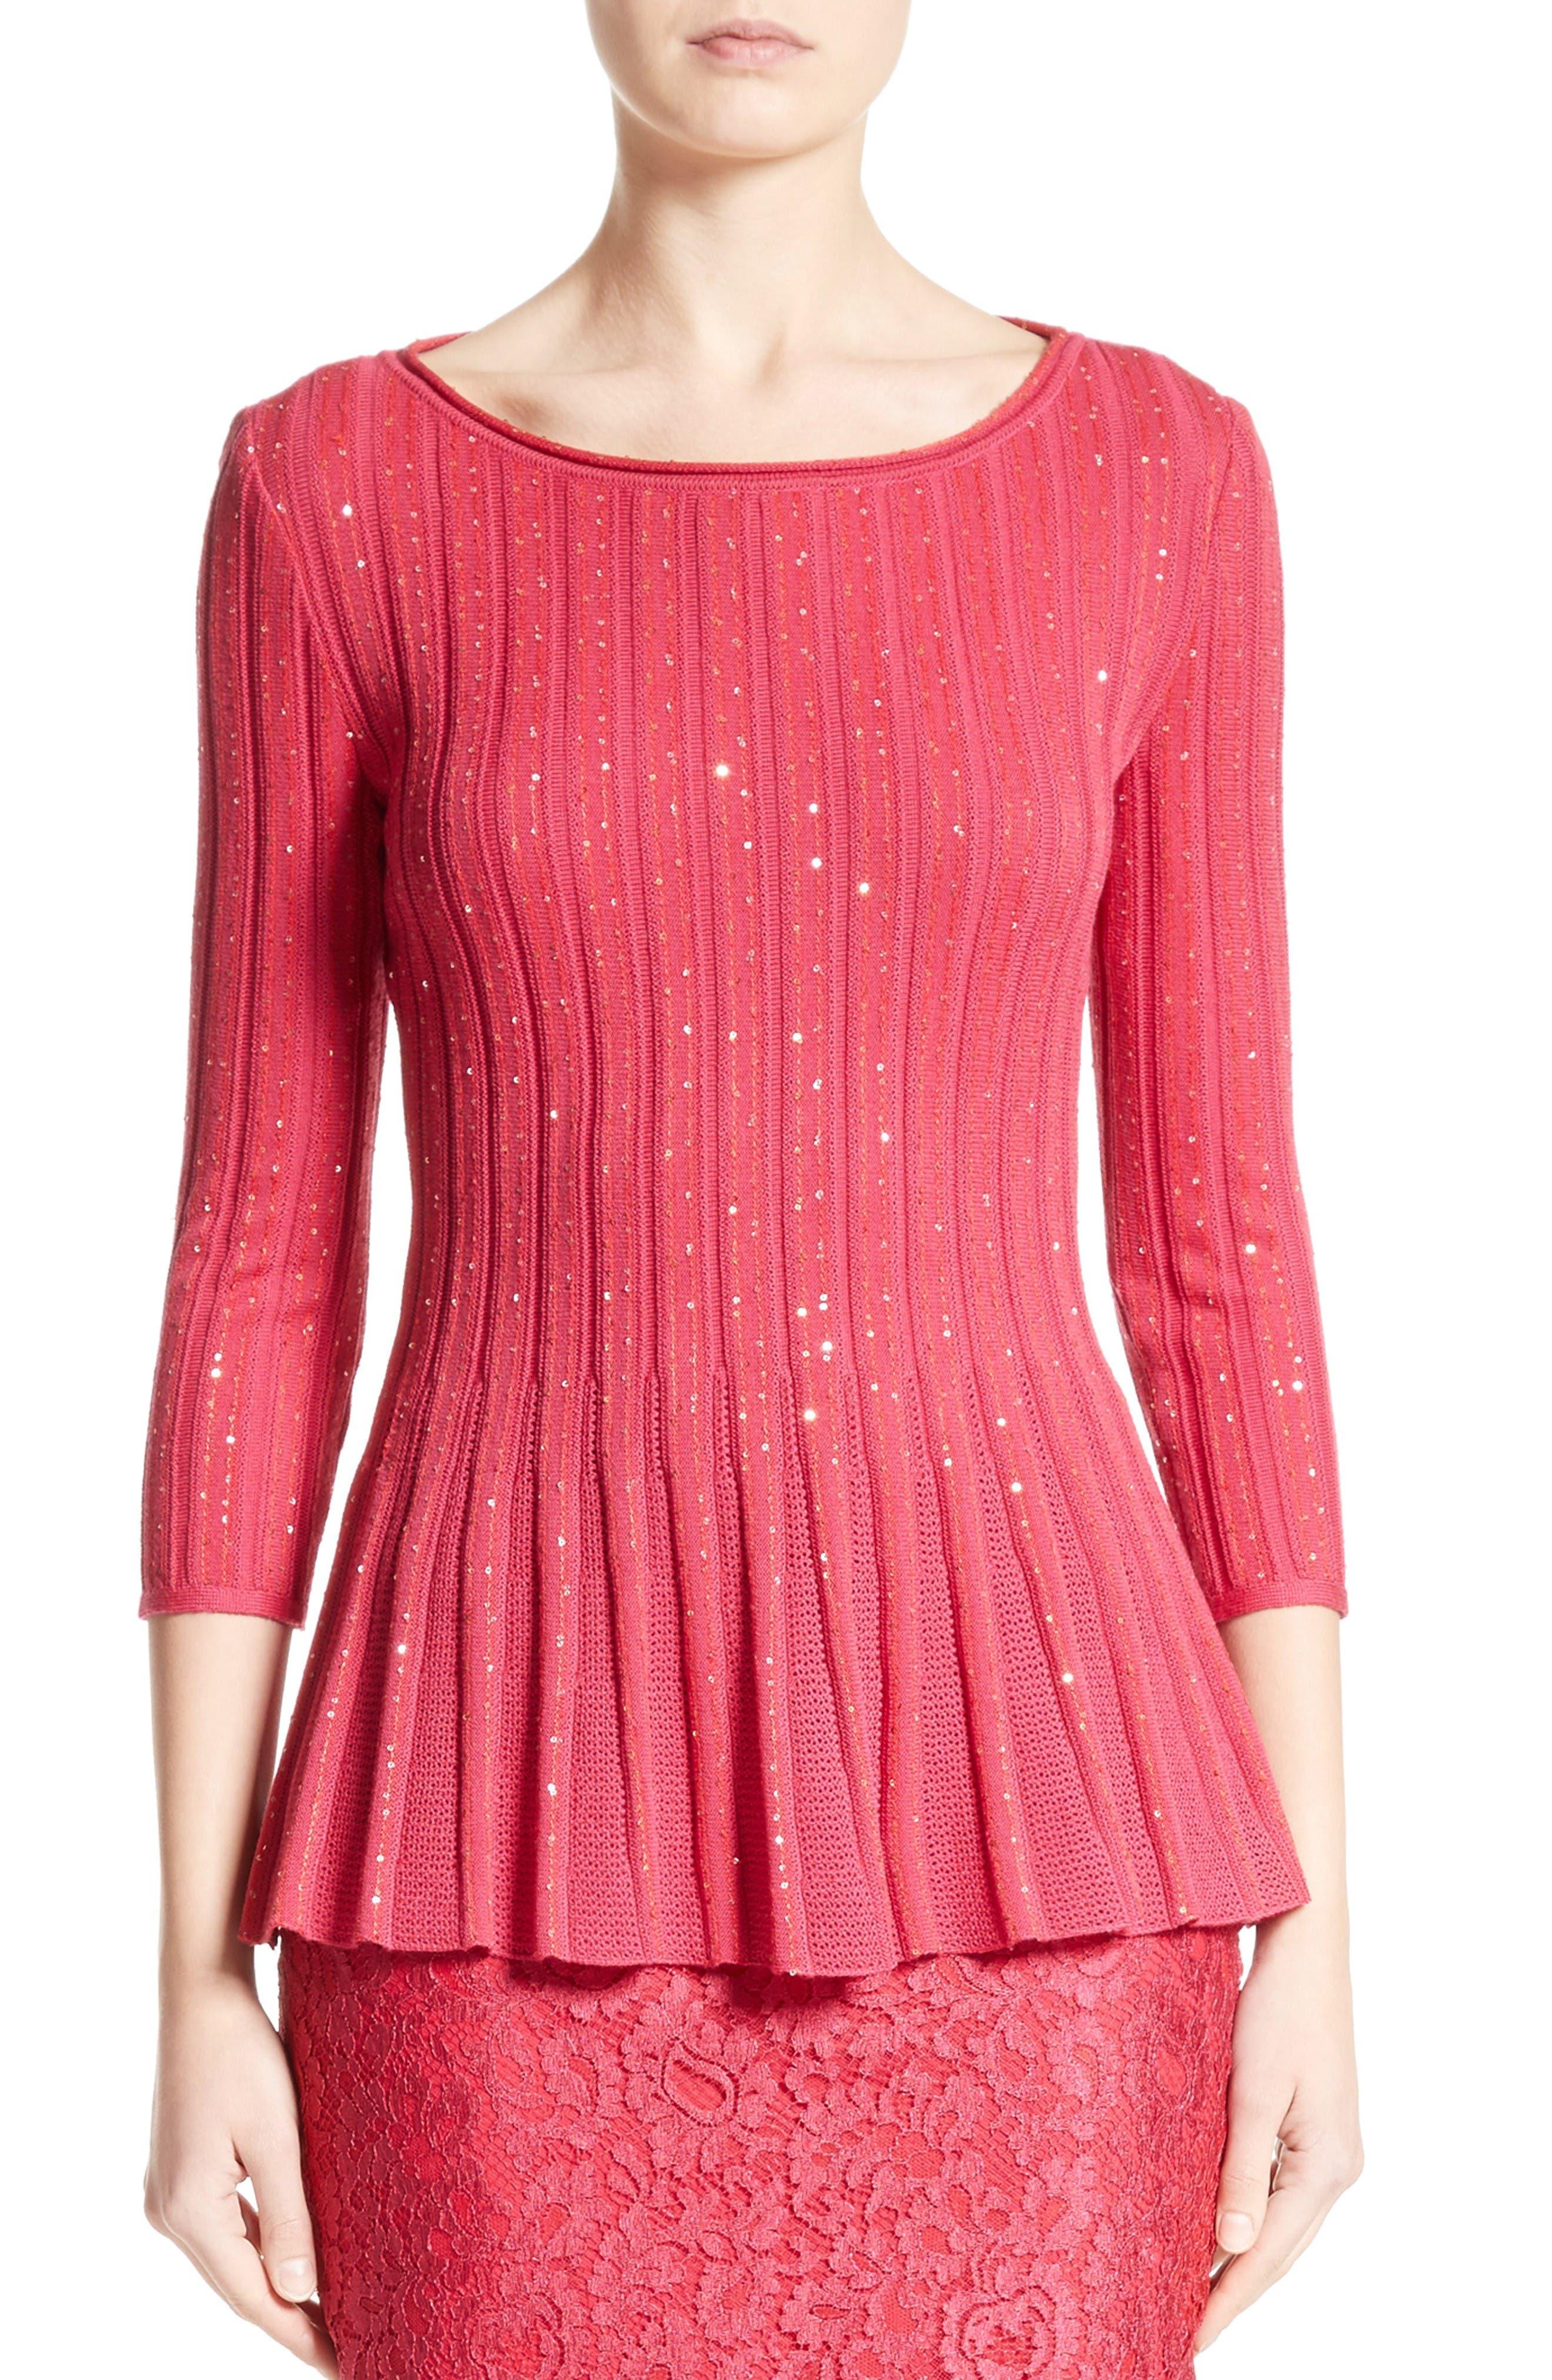 Chriag Sequin Knit Peplum Top,                         Main,                         color, Indian Rose